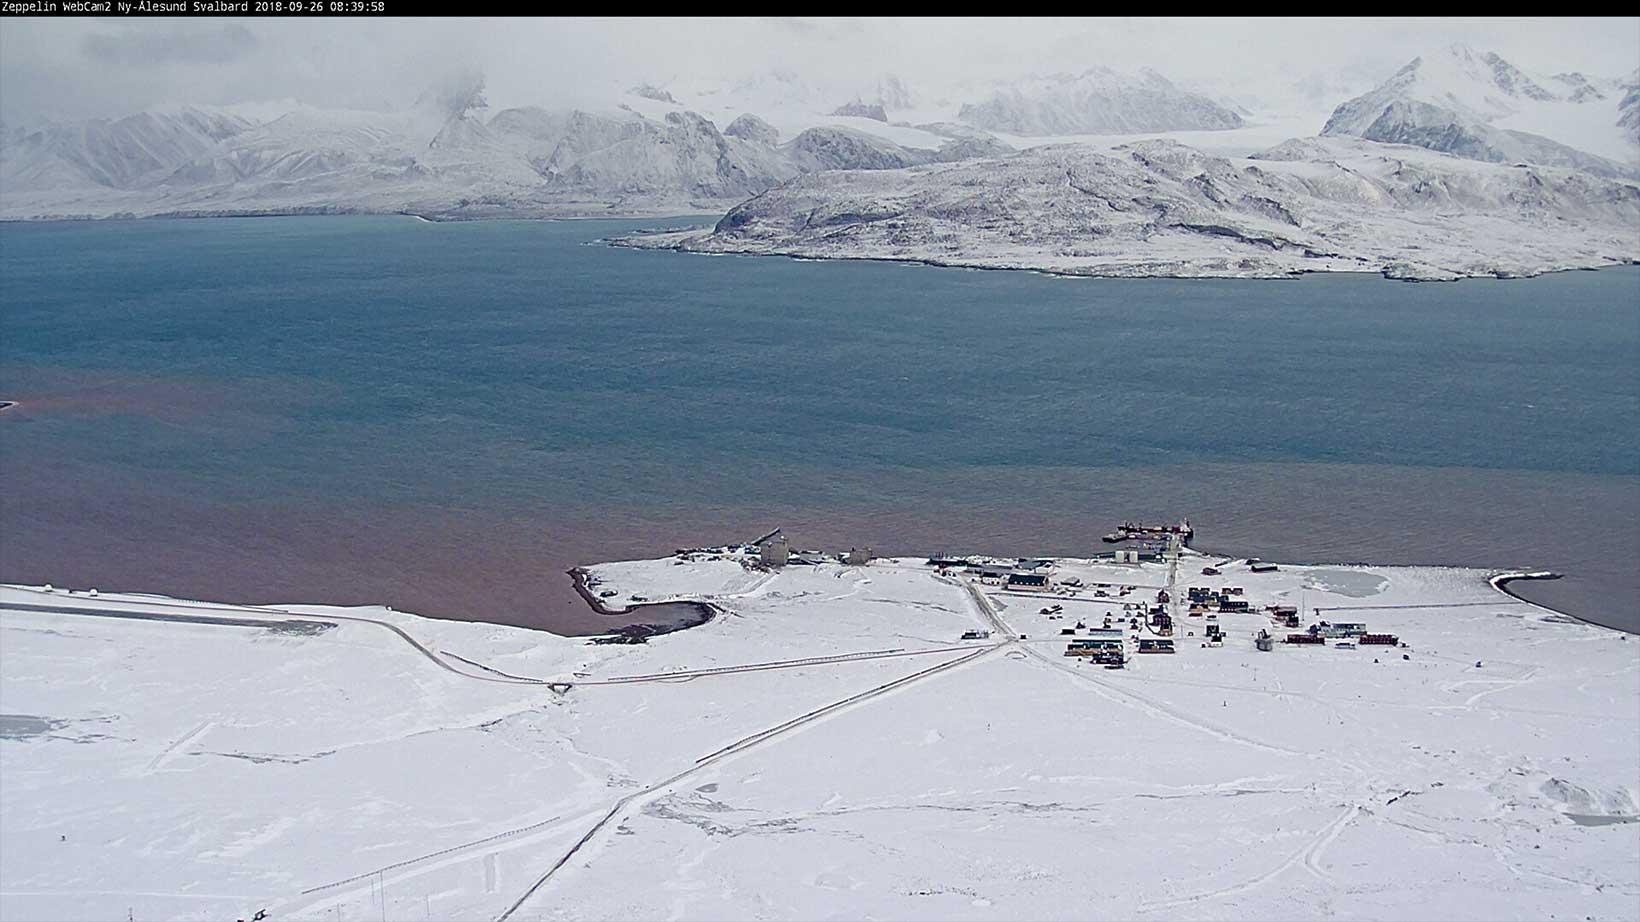 Svalbard webcam